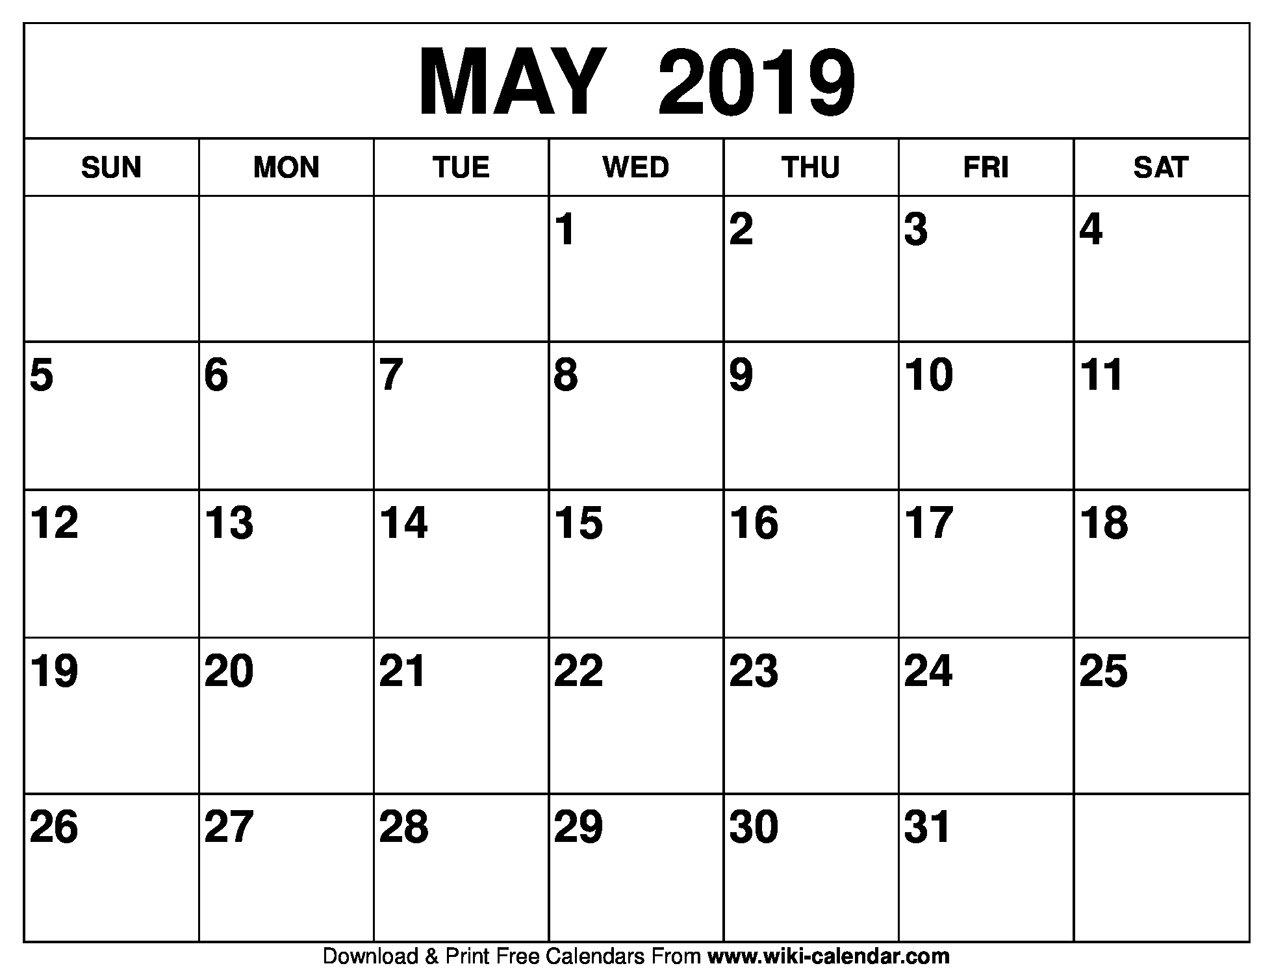 Blank May 2019 Calendar Printable May 9 2019 Calendar